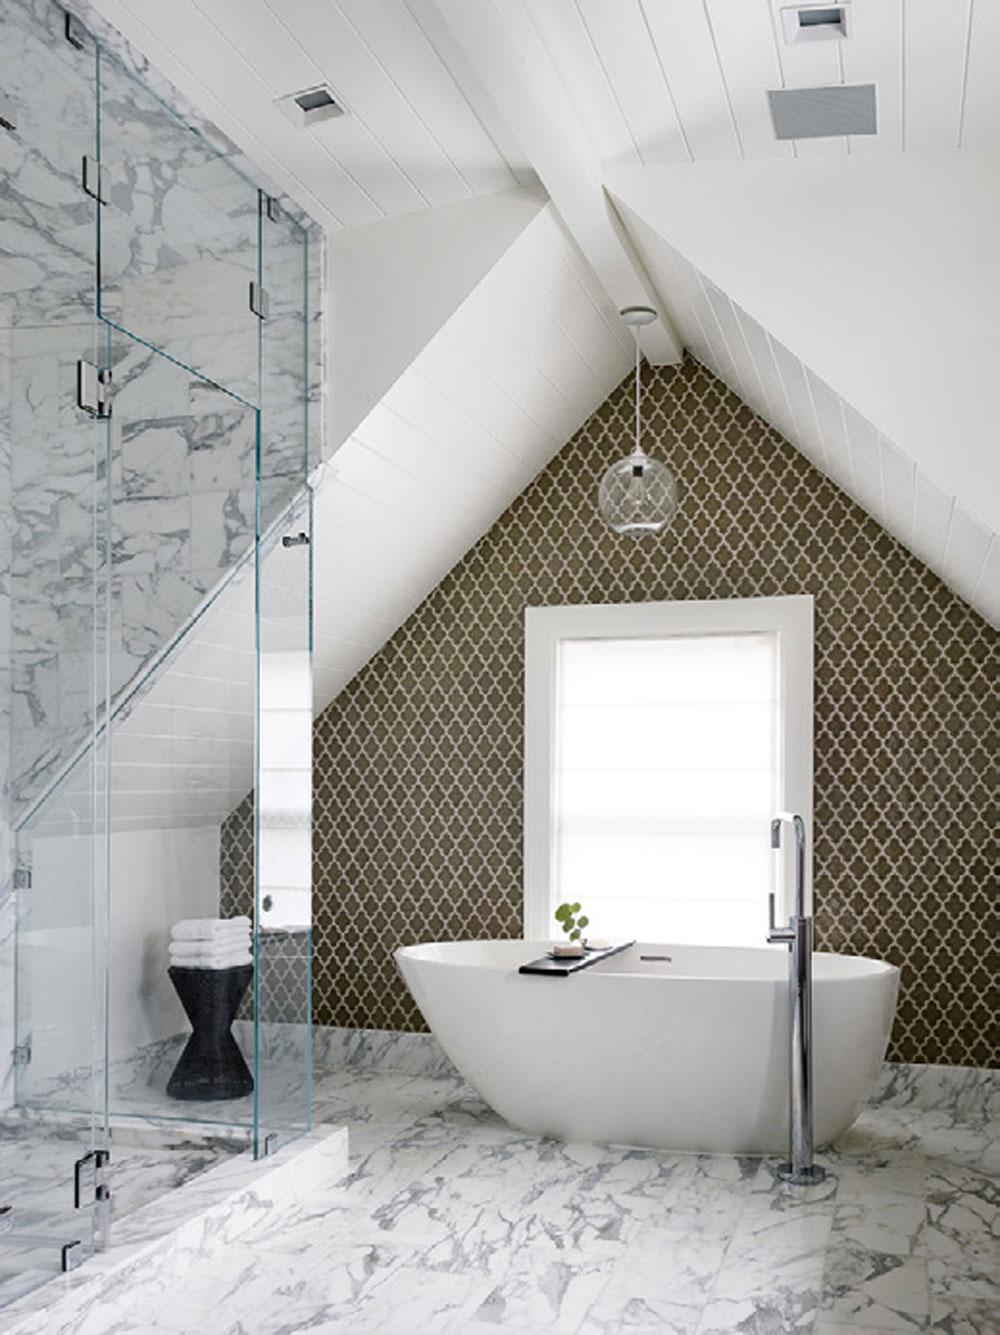 A-collection-of-bathroom-floor-tile-ideas-10 A collection of bathroom-floor-tile-ideas